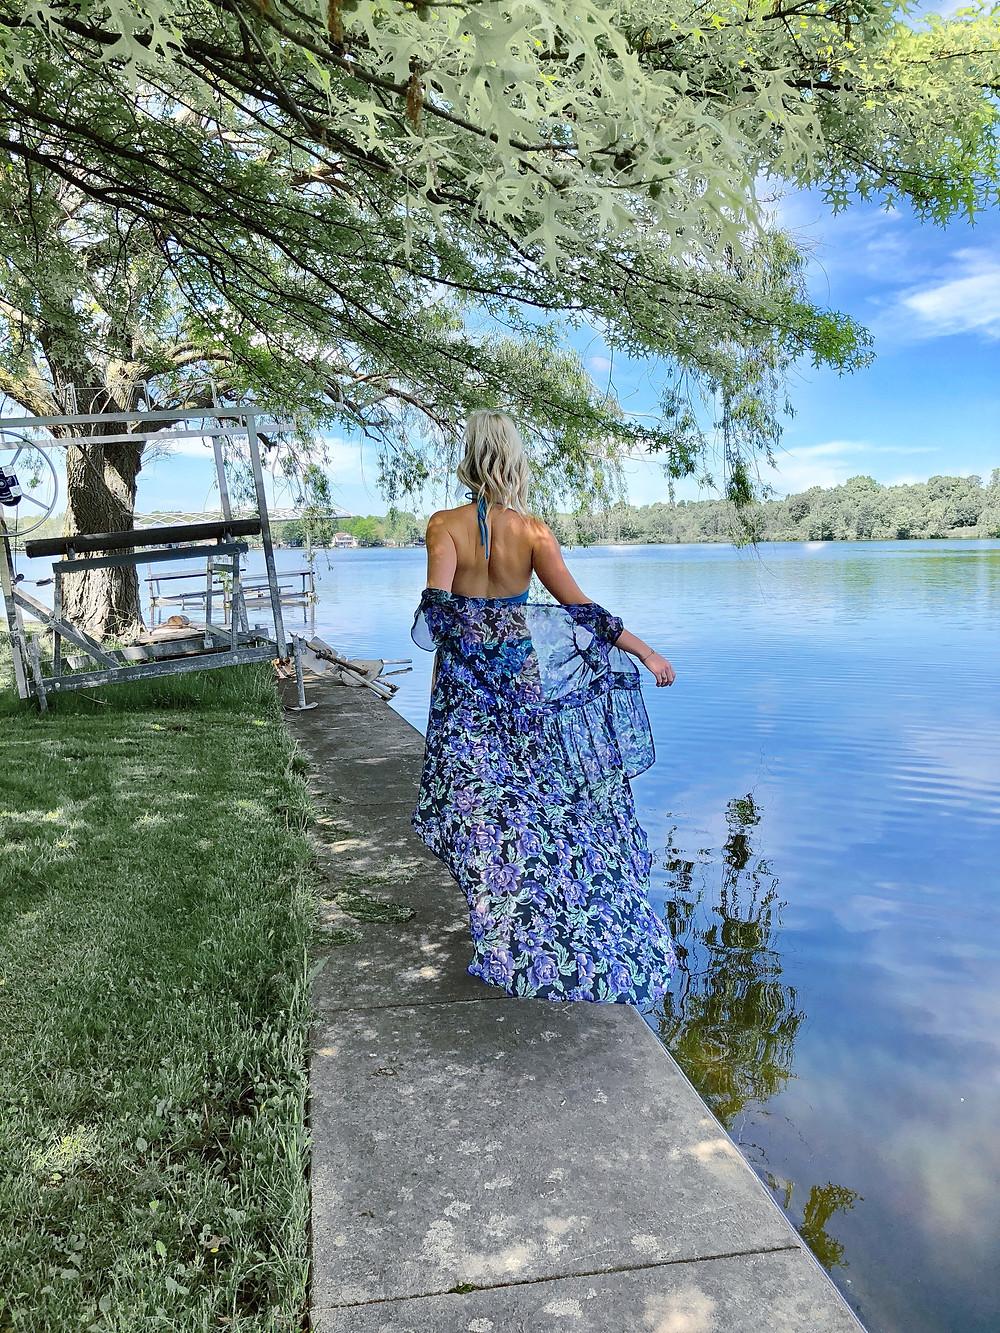 Caitlin Eliza Summer Bucket List with Upbra